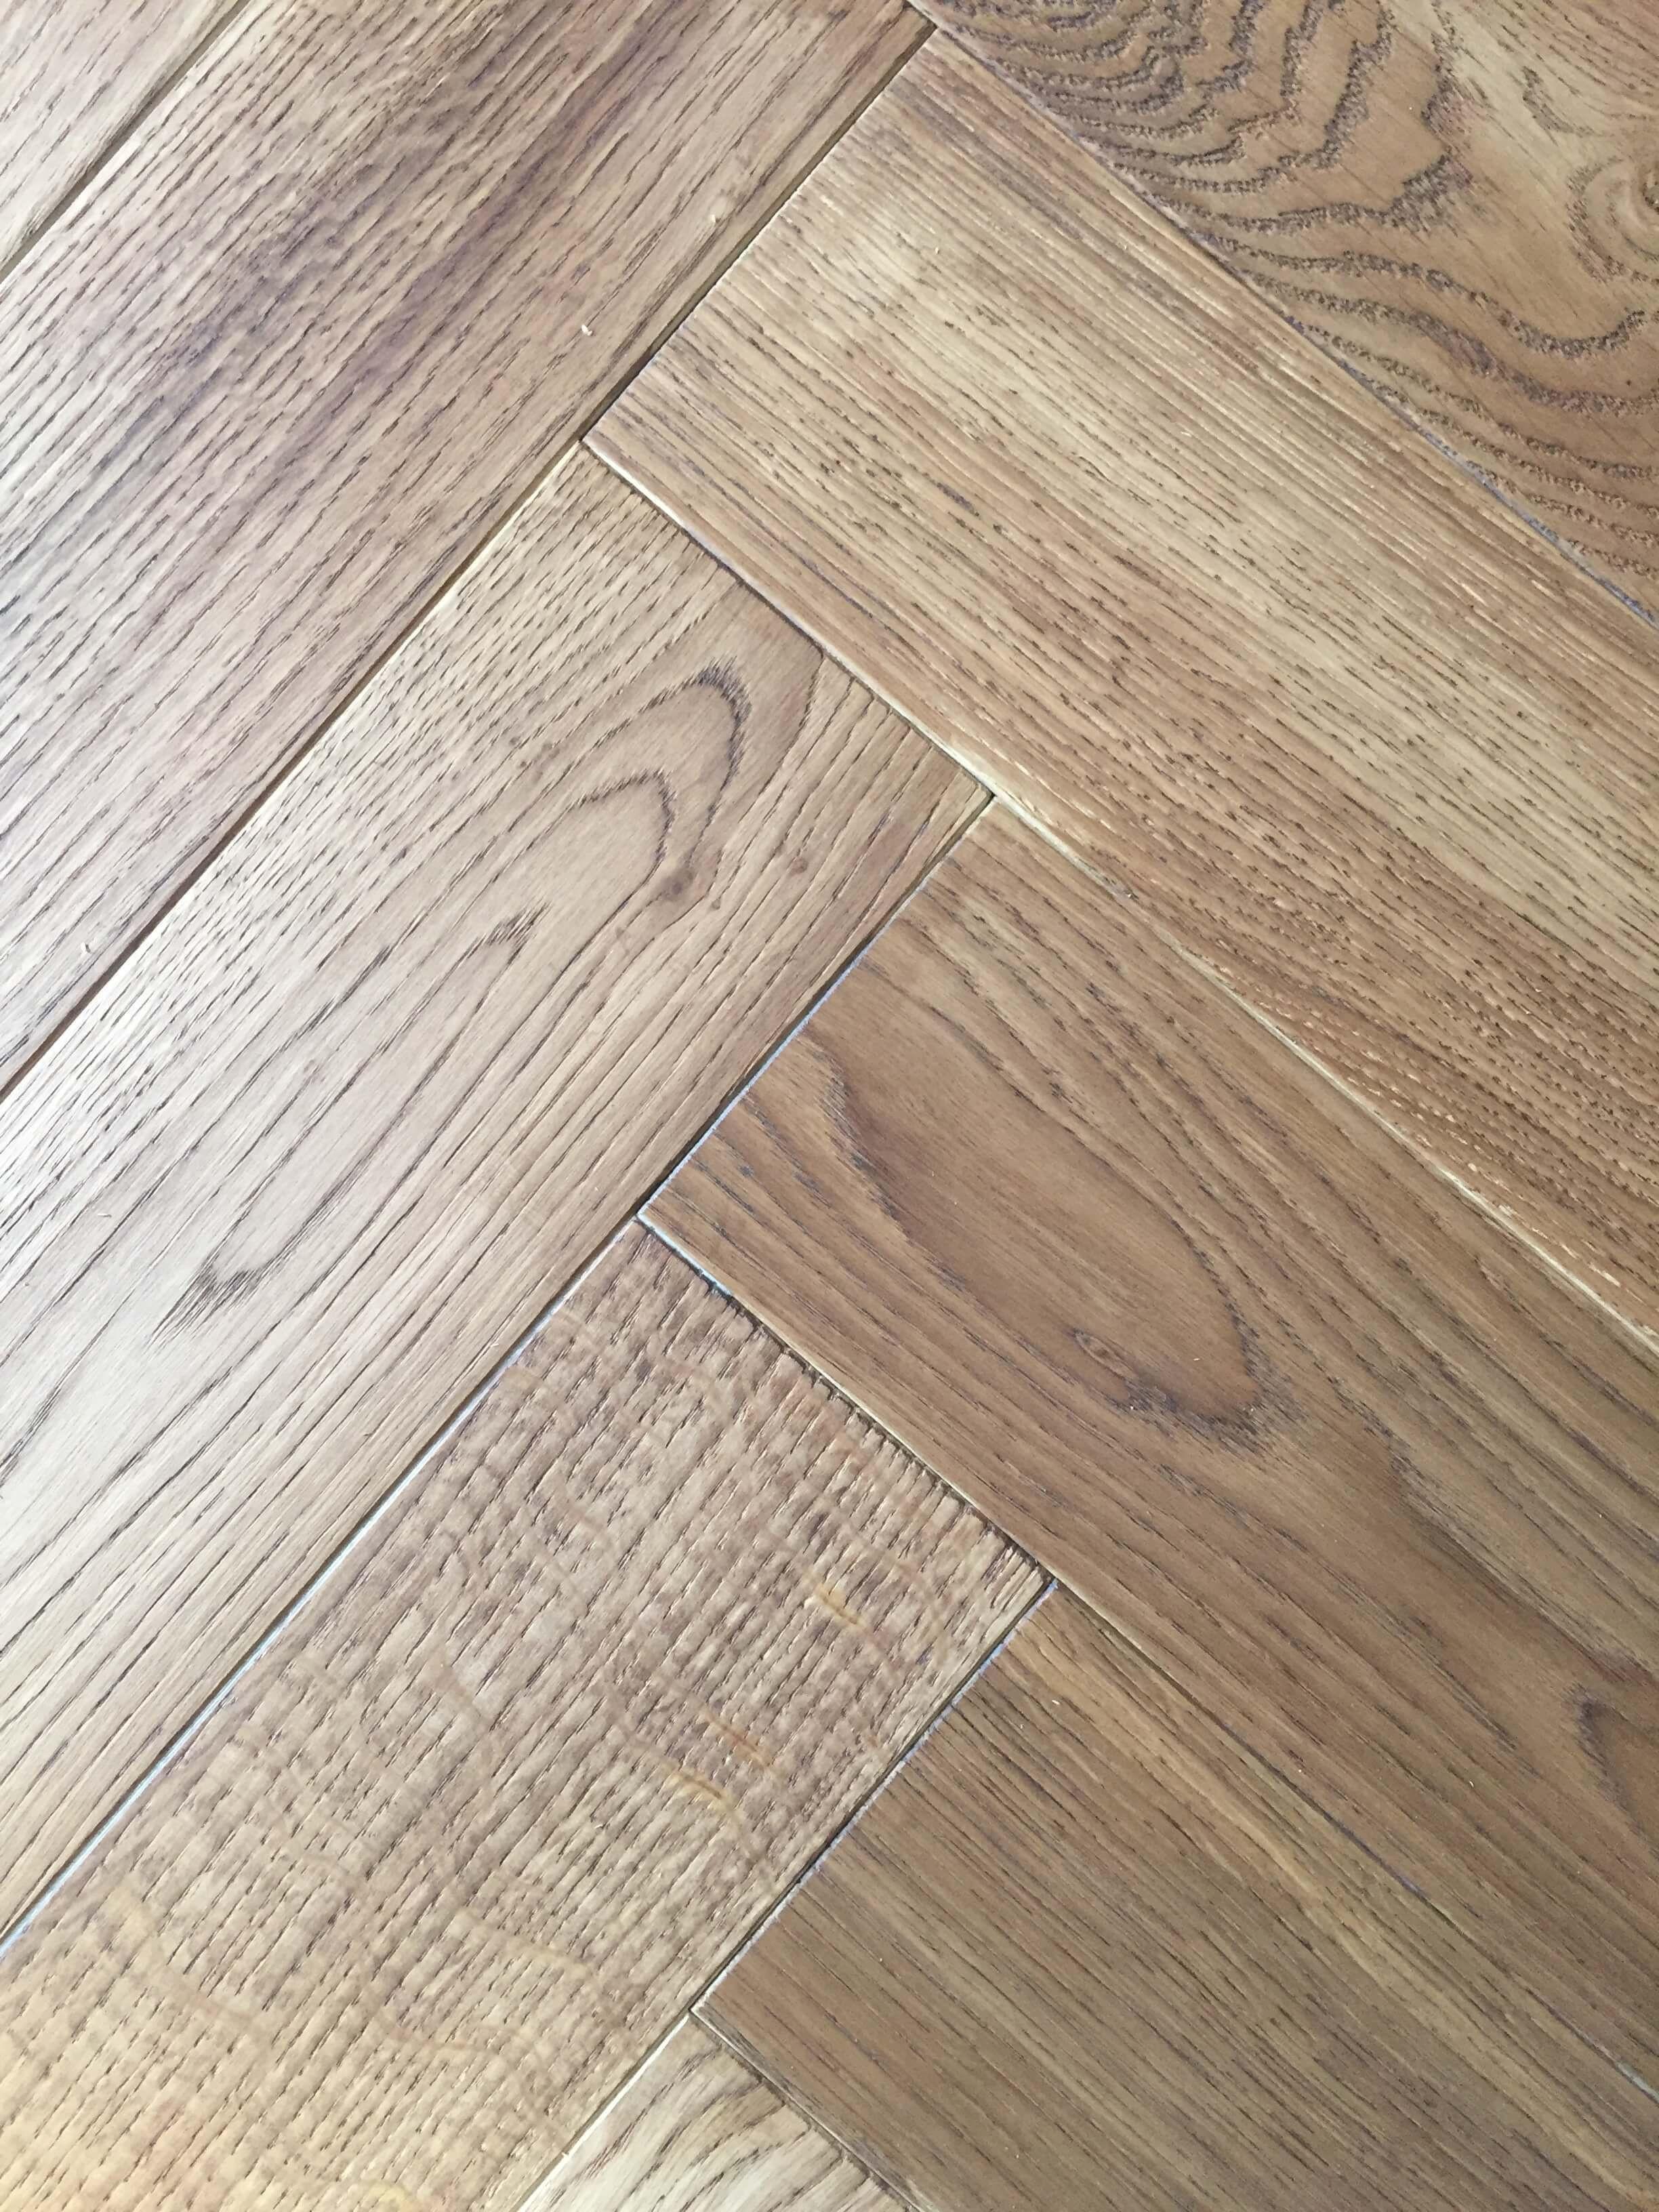 acacia hardwood flooring pros and cons of handscraped engineered hardwood awesome engineered wood flooring inside handscraped engineered hardwood awesome engineered wood flooring brown maple hand scraped engineered images